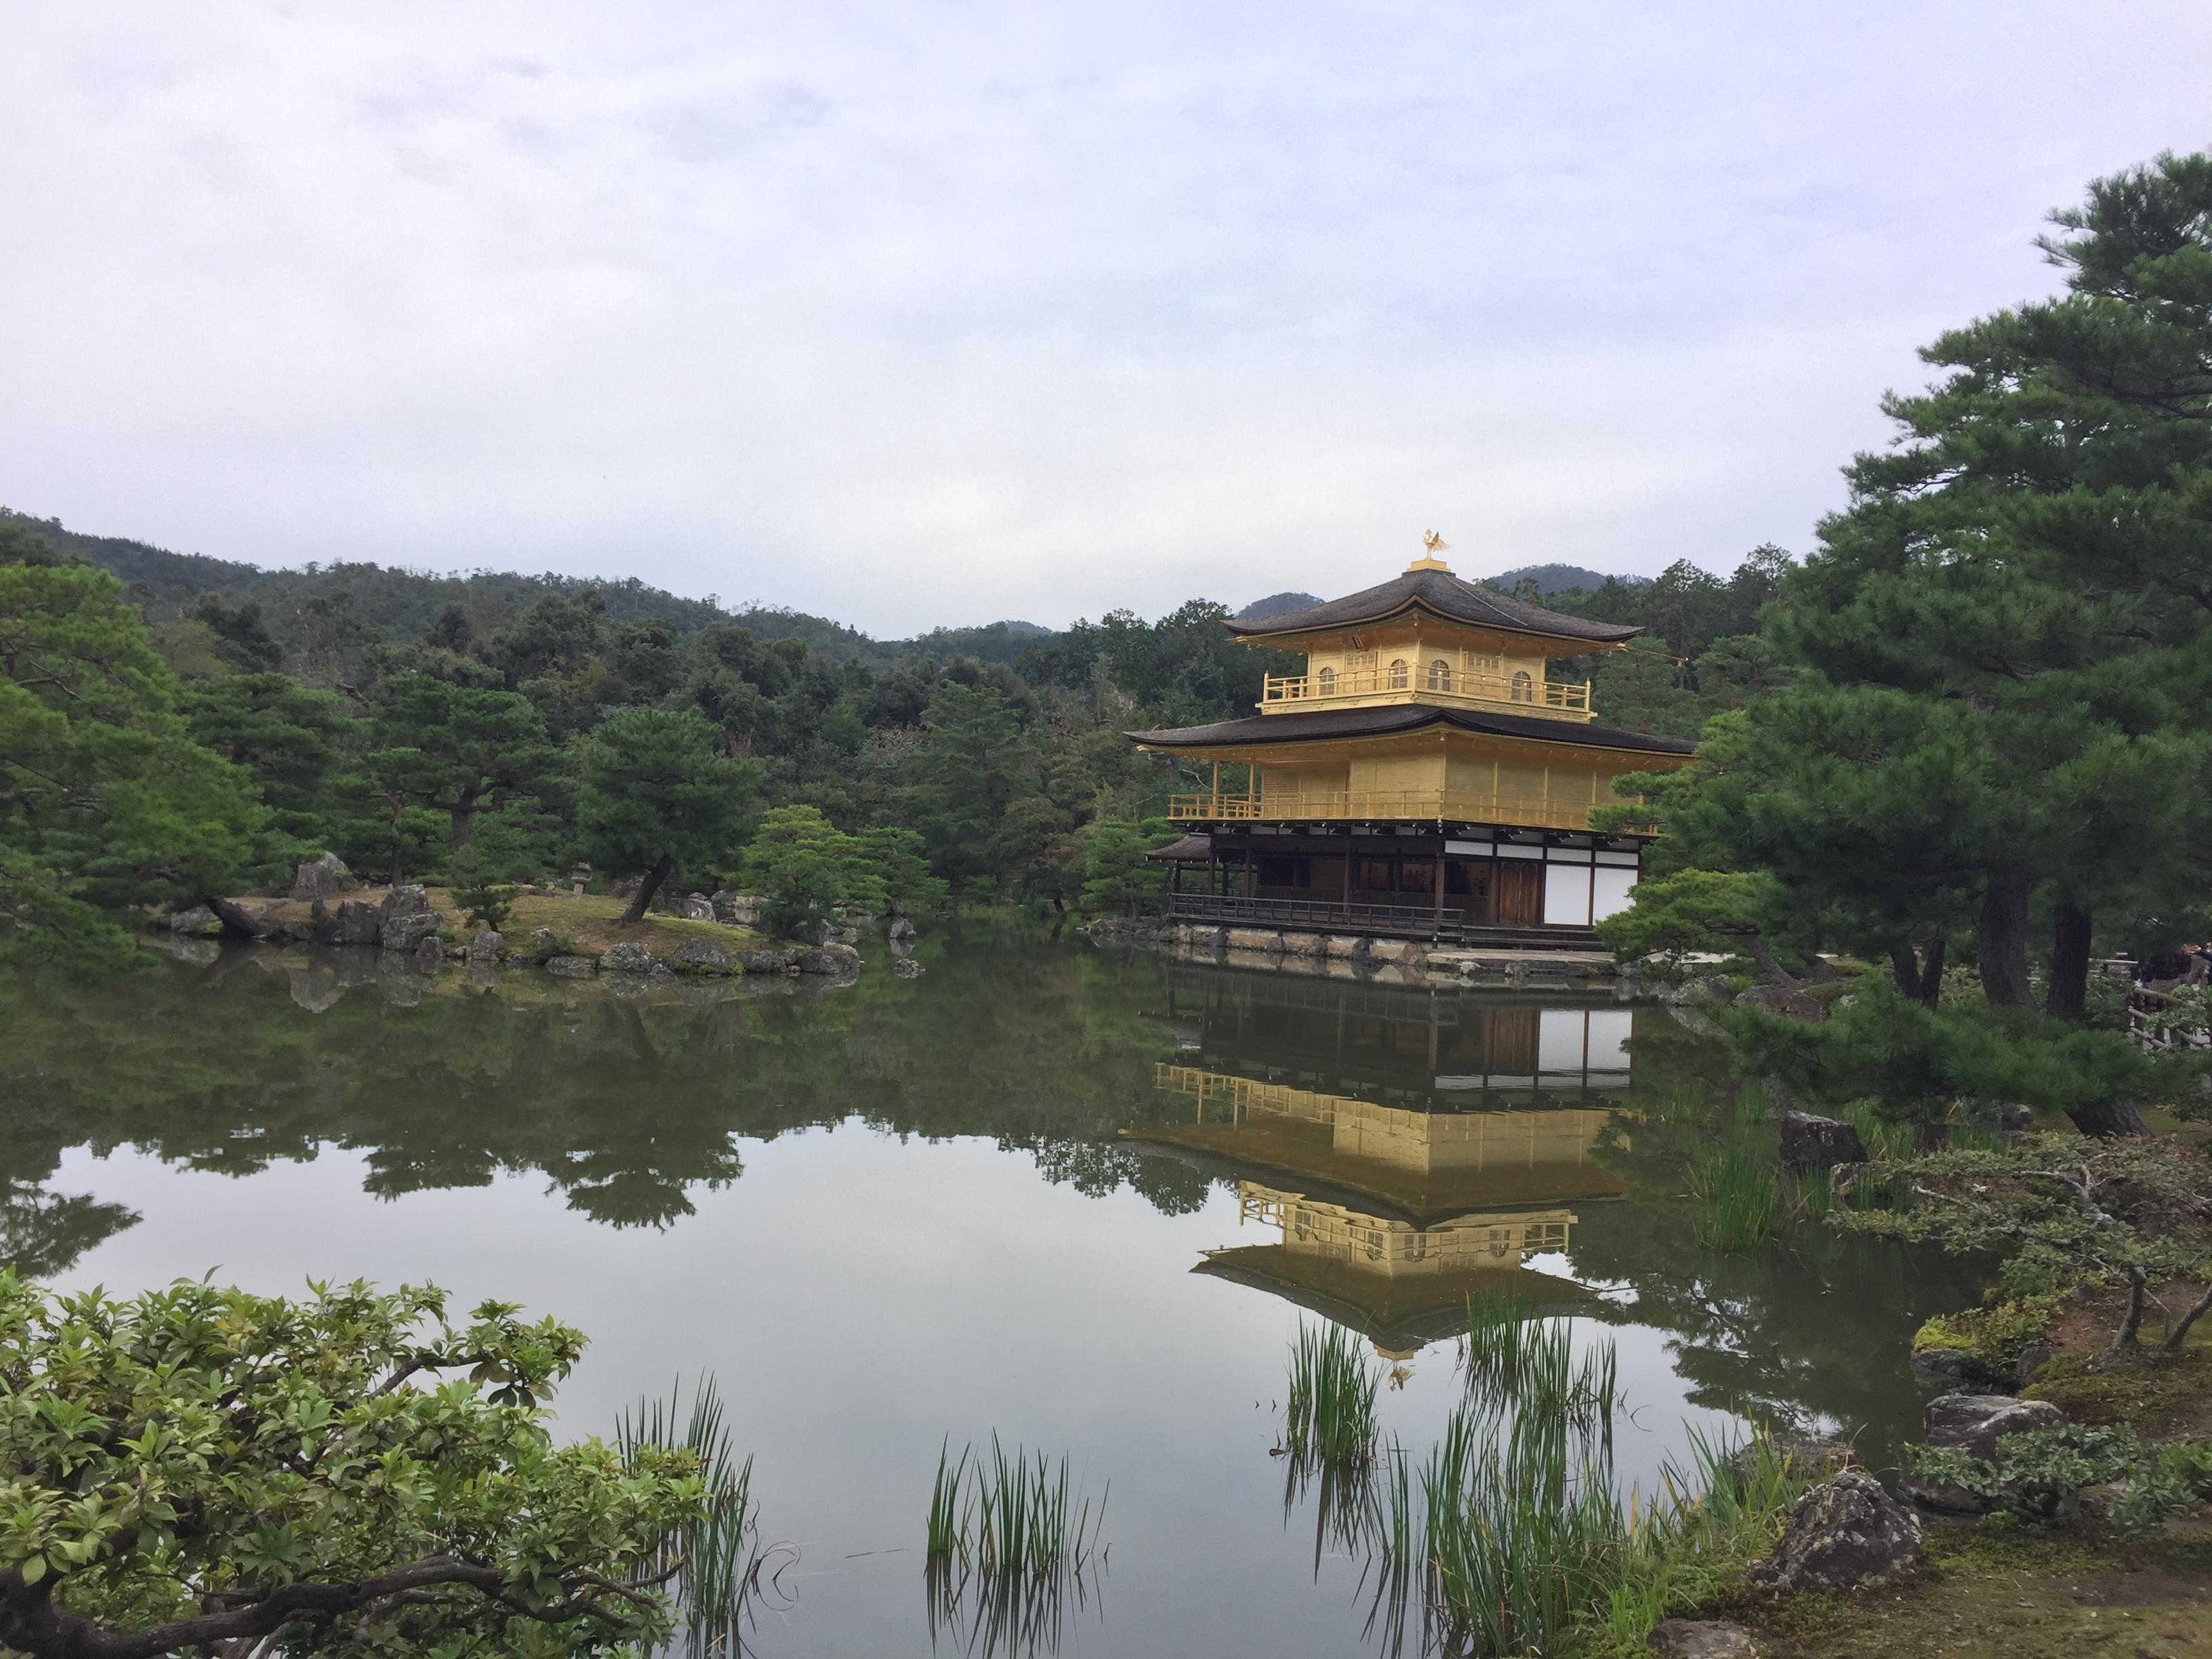 Japan Golden Temple Kyoto Kinkaku-ji